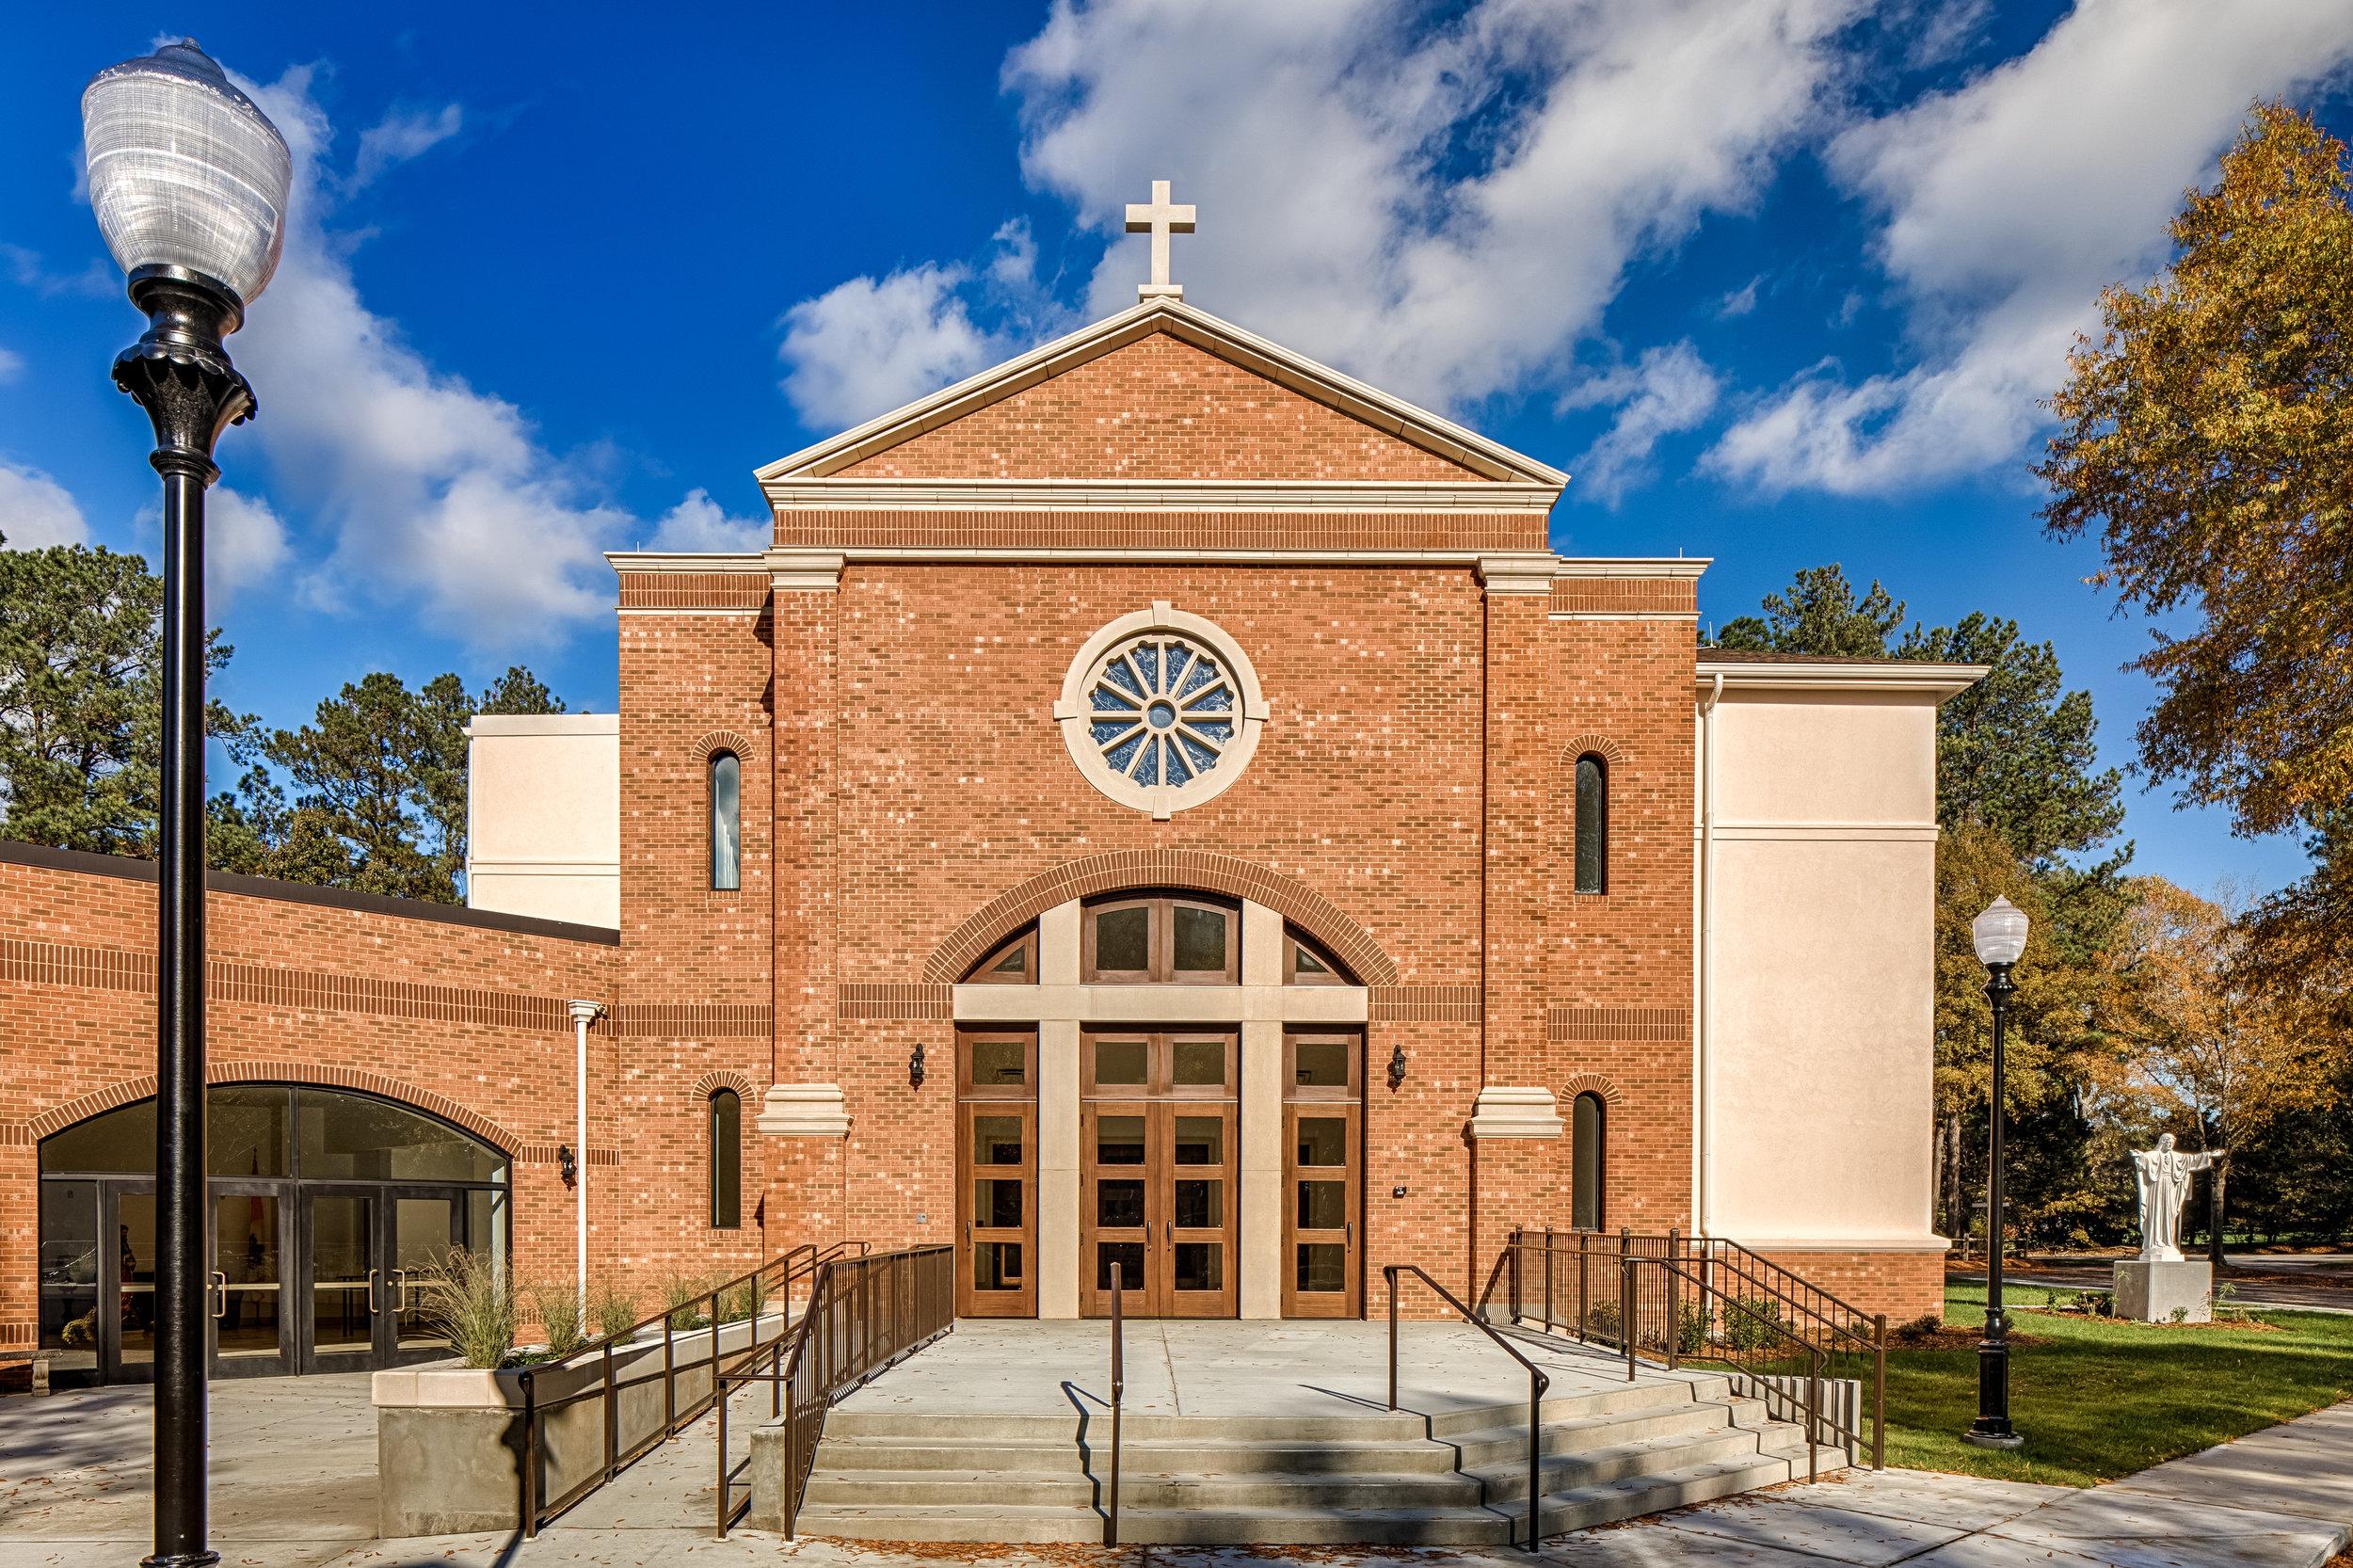 Dedication of St. Luke the Evangelist Roman Catholic Church - December 2017